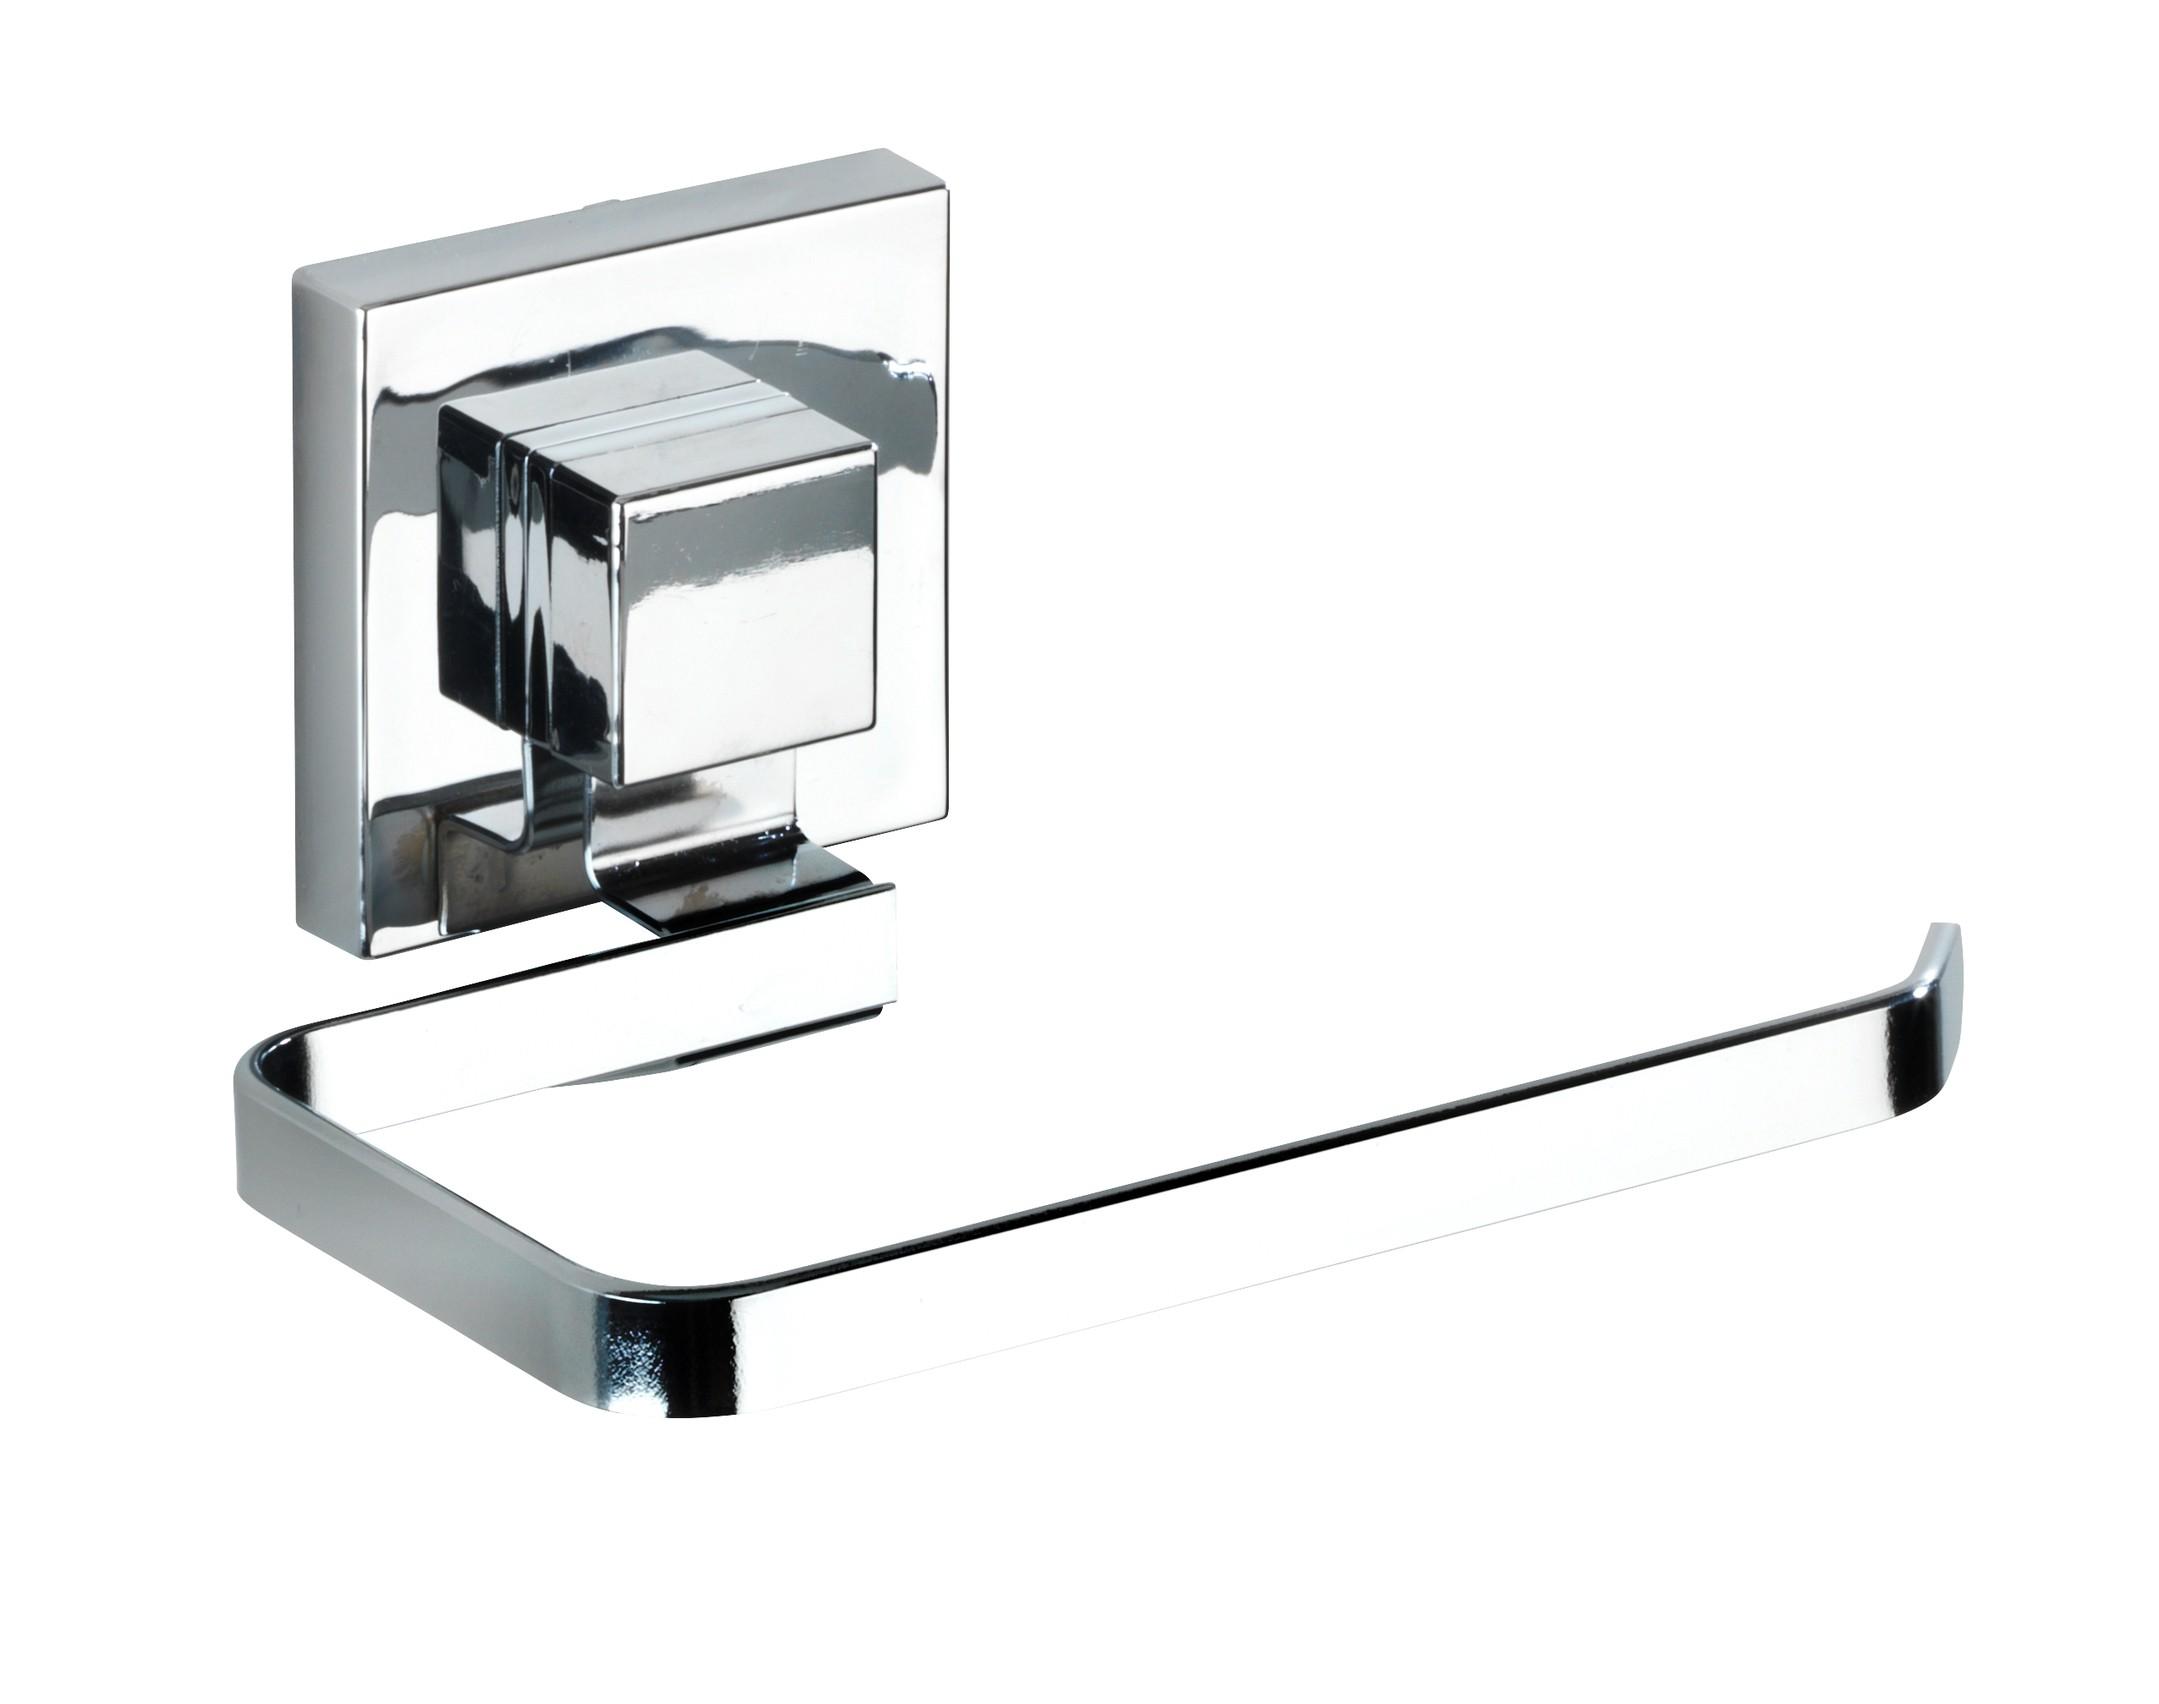 Wenko Vacuum-Loc® Toilettenpapierhalter Quadro, Edelstahl, Befestigen ohne bohren